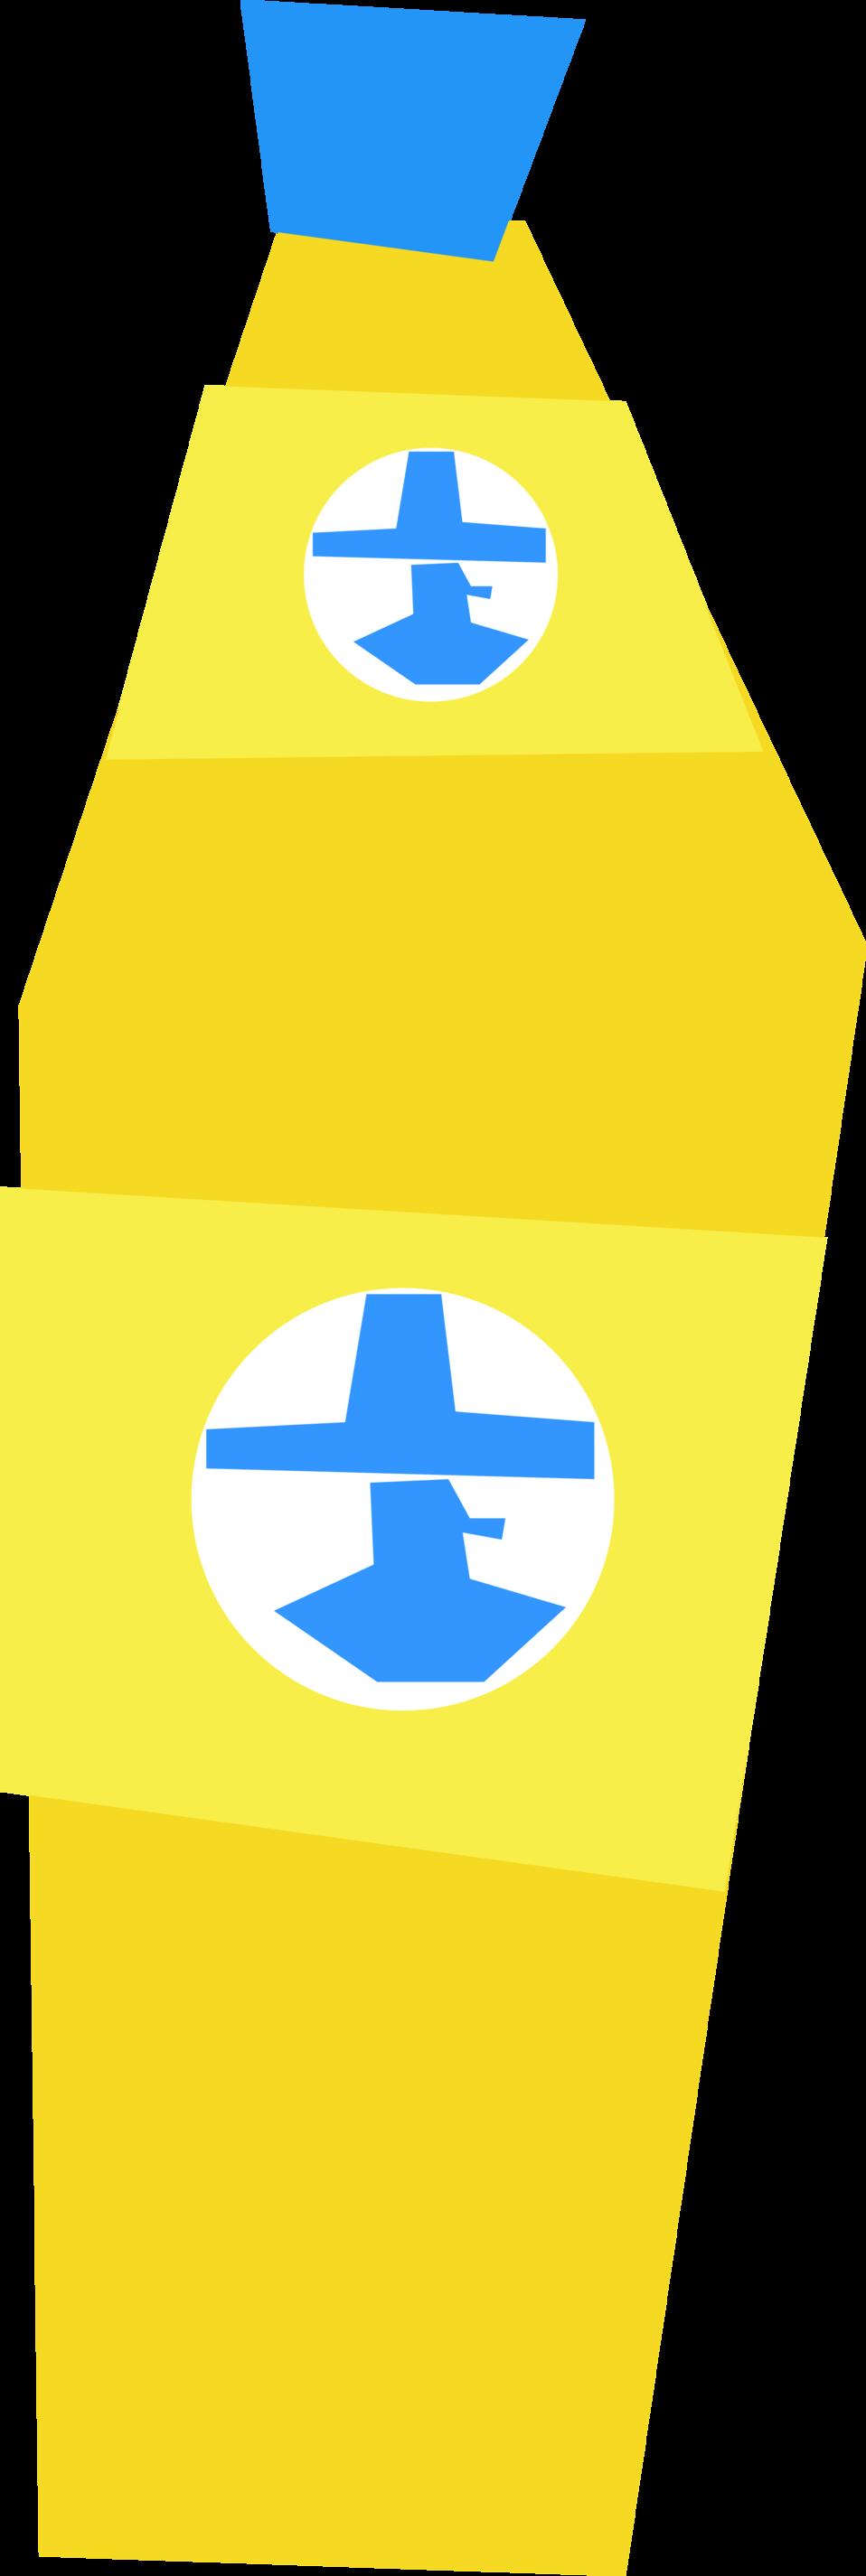 Simple Cartoon Energy Drink Bottle